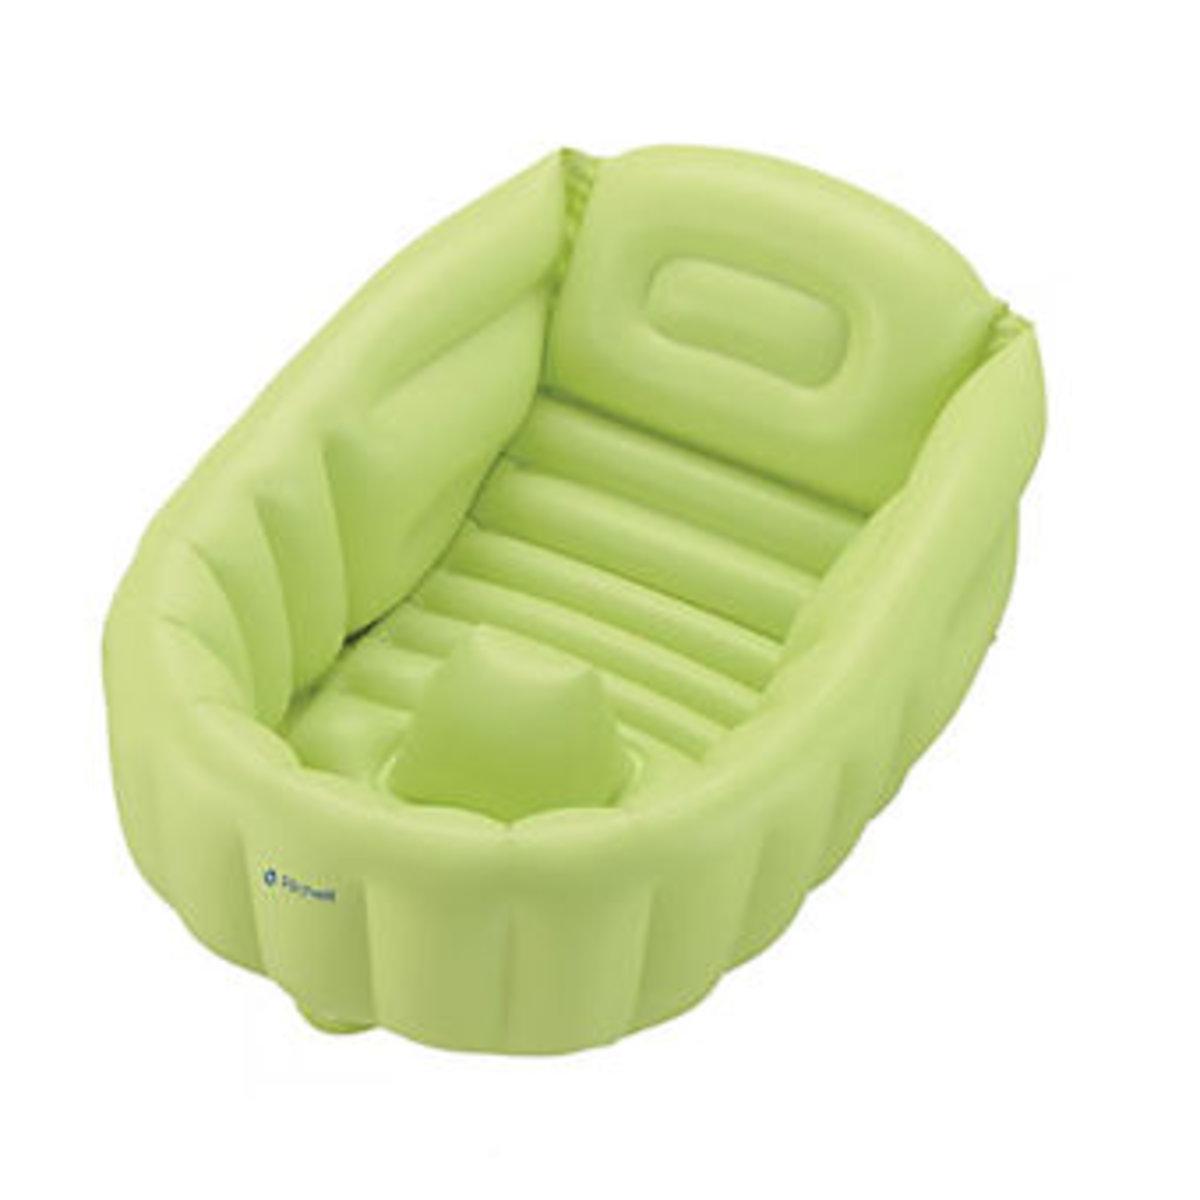 Inflatable Bathtub (Green)(213223)